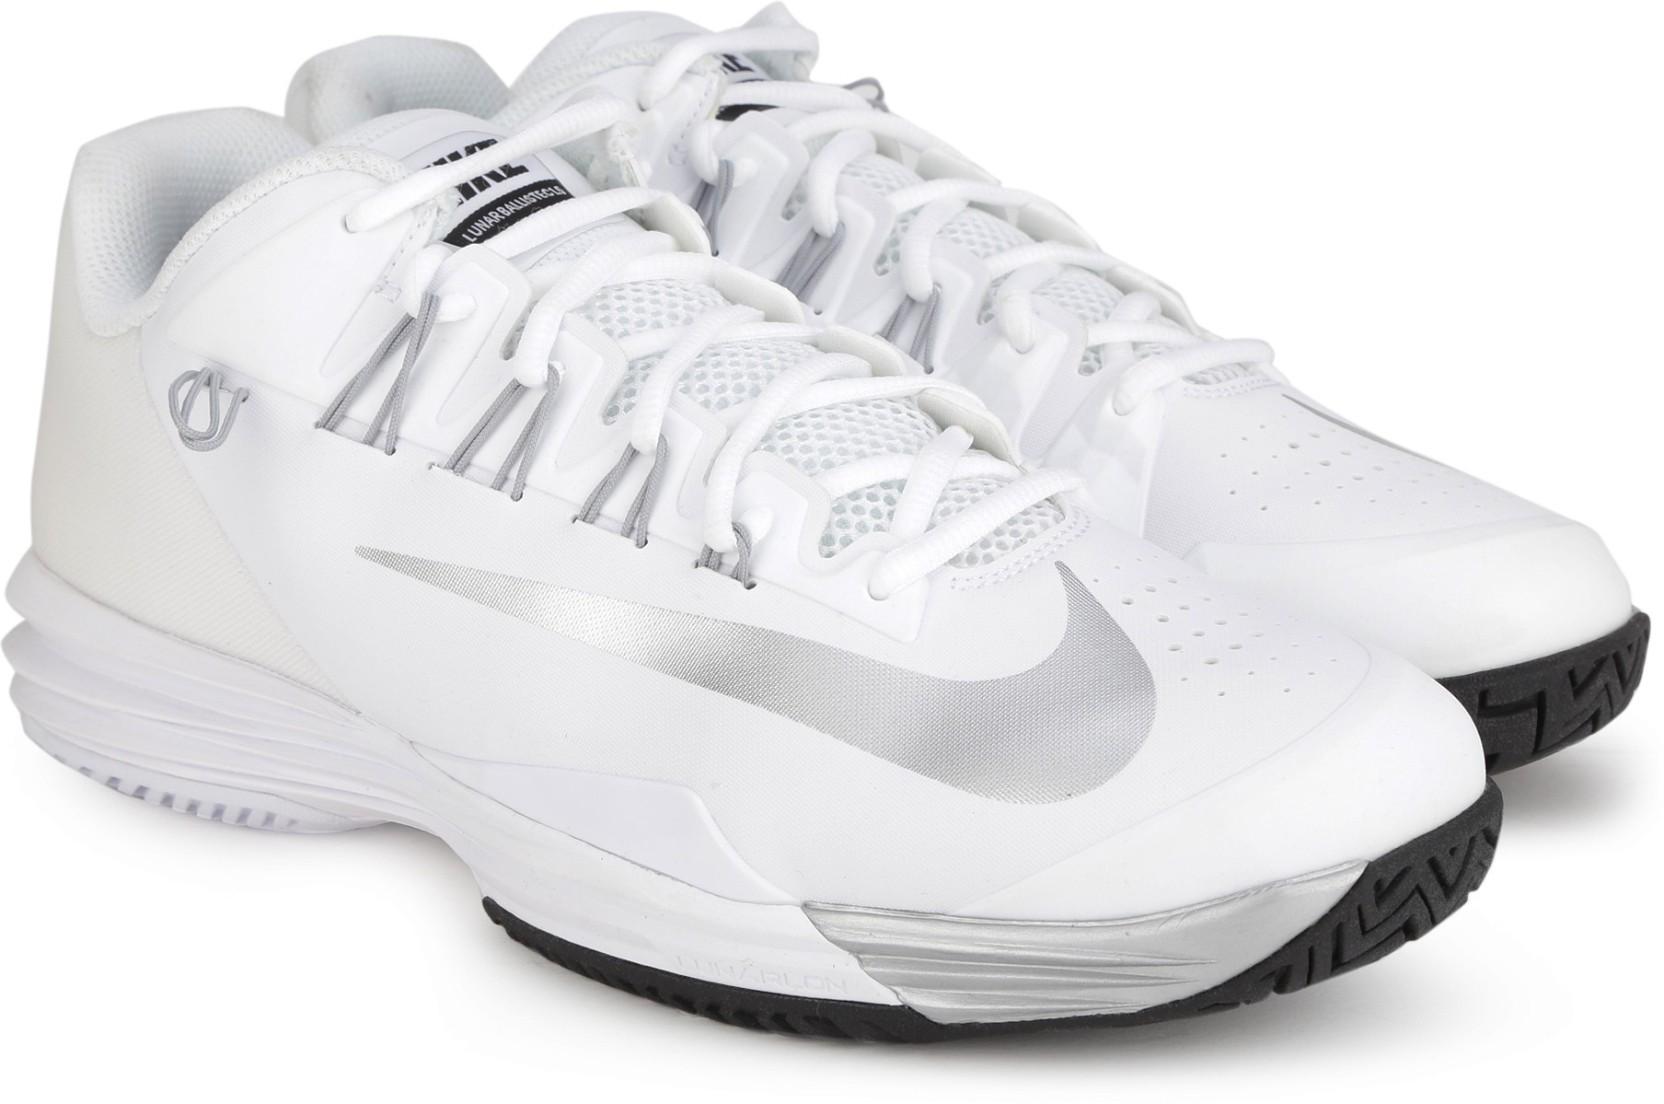 3a8cbfd5df09 ... Nike LUNAR BALLISTEC 1.5 Tennis Shoes For Men (White) ...